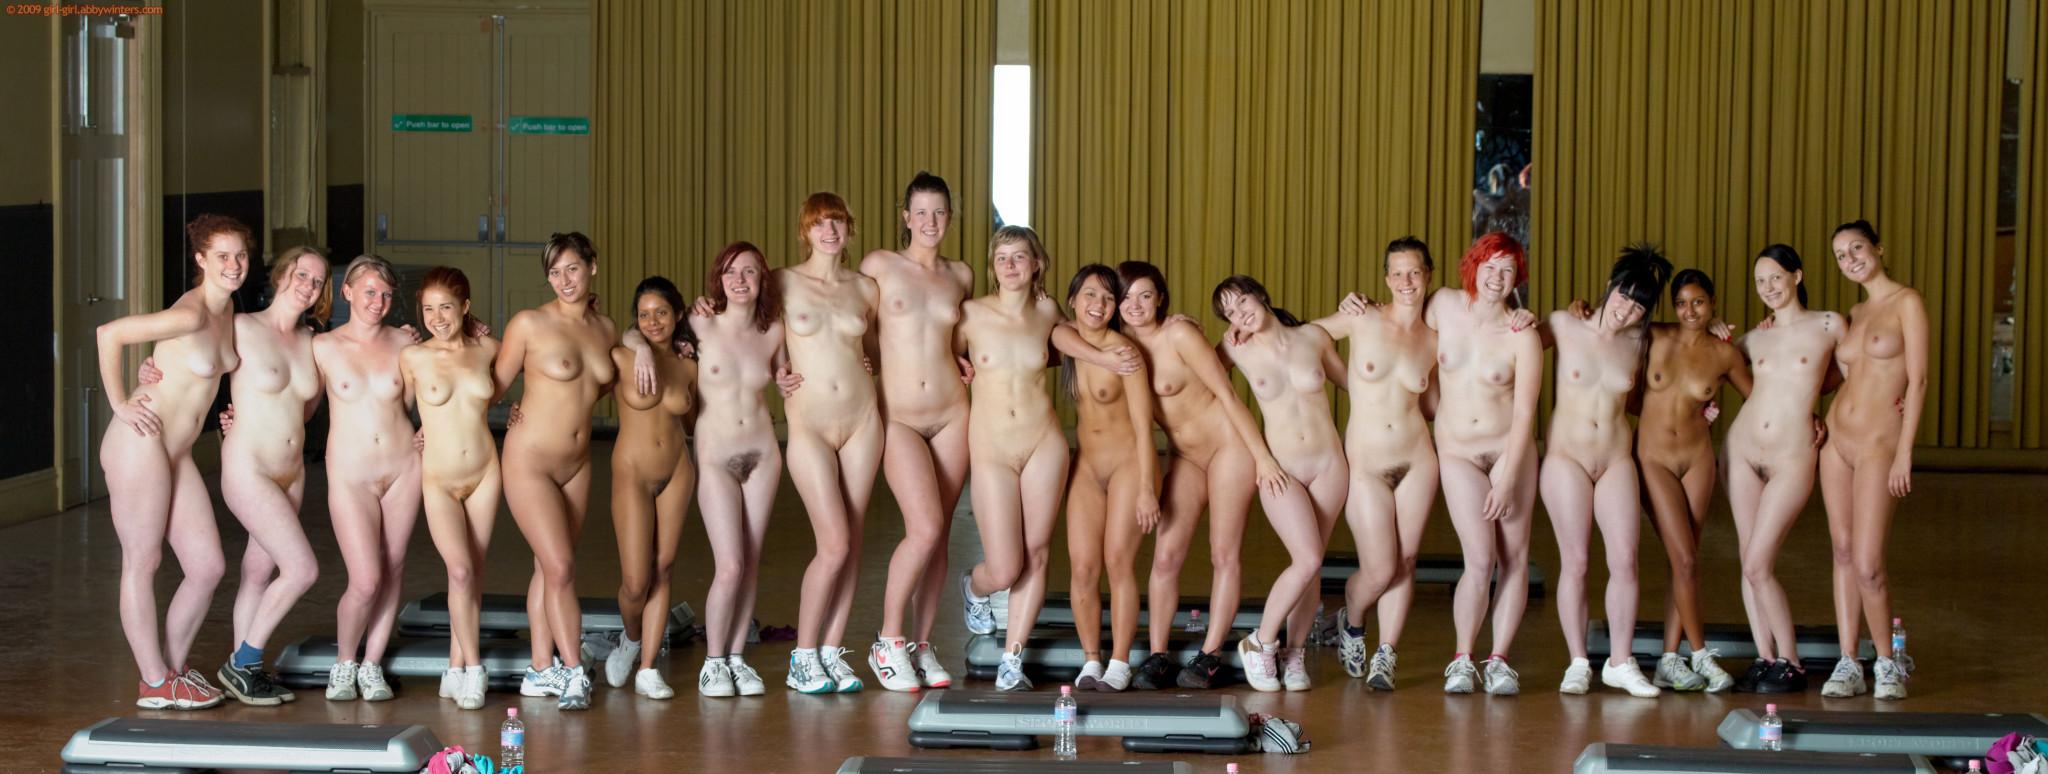 girls aerobics naked